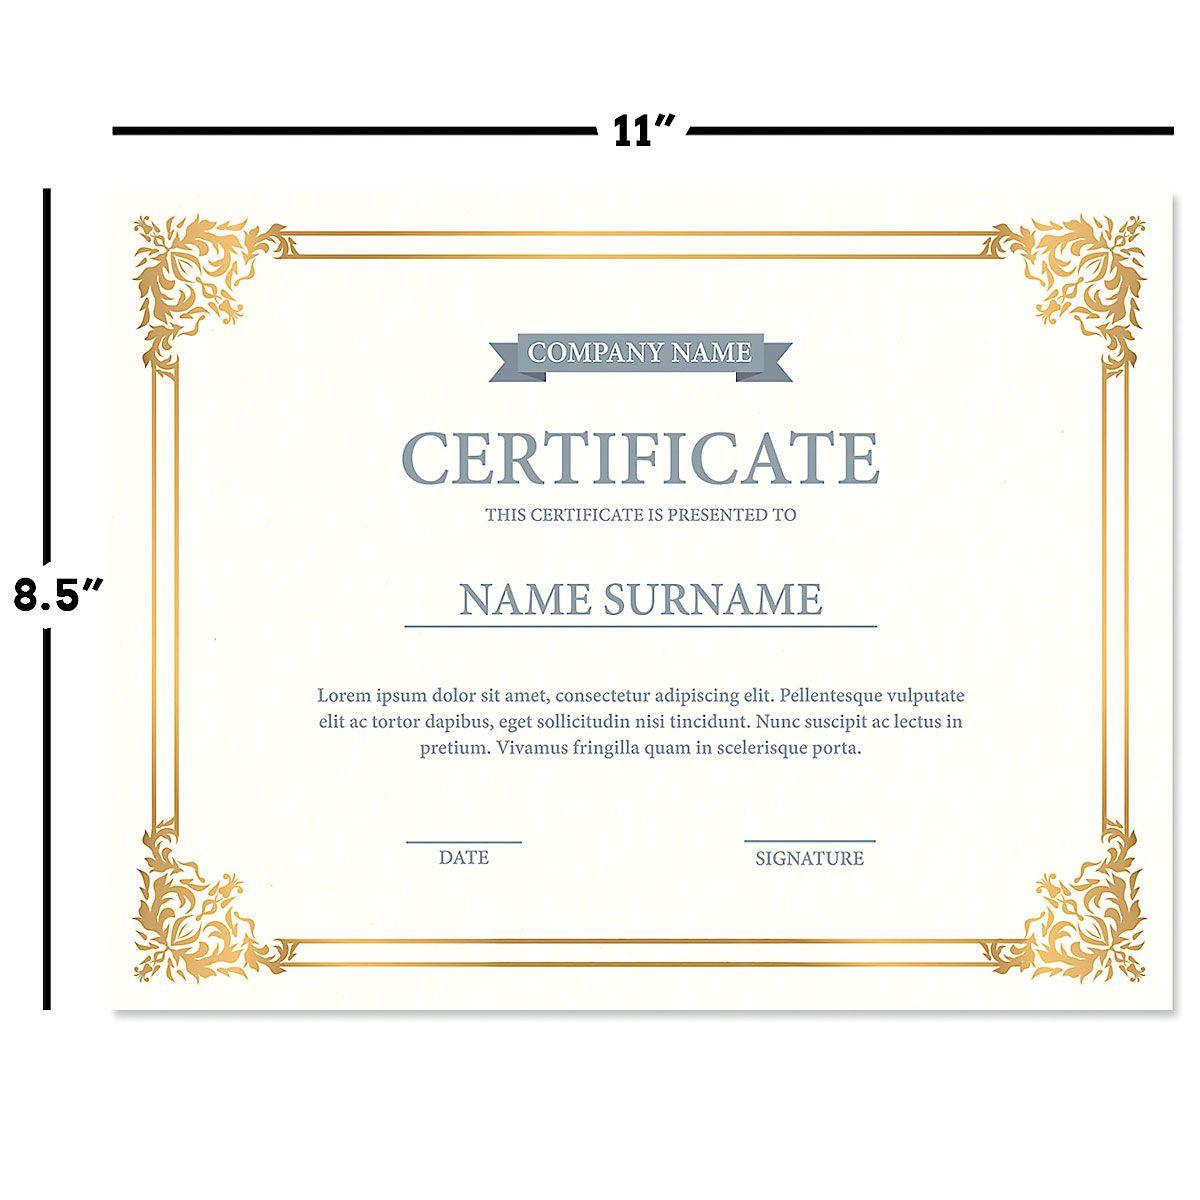 Ornate Empire Certificate Collection